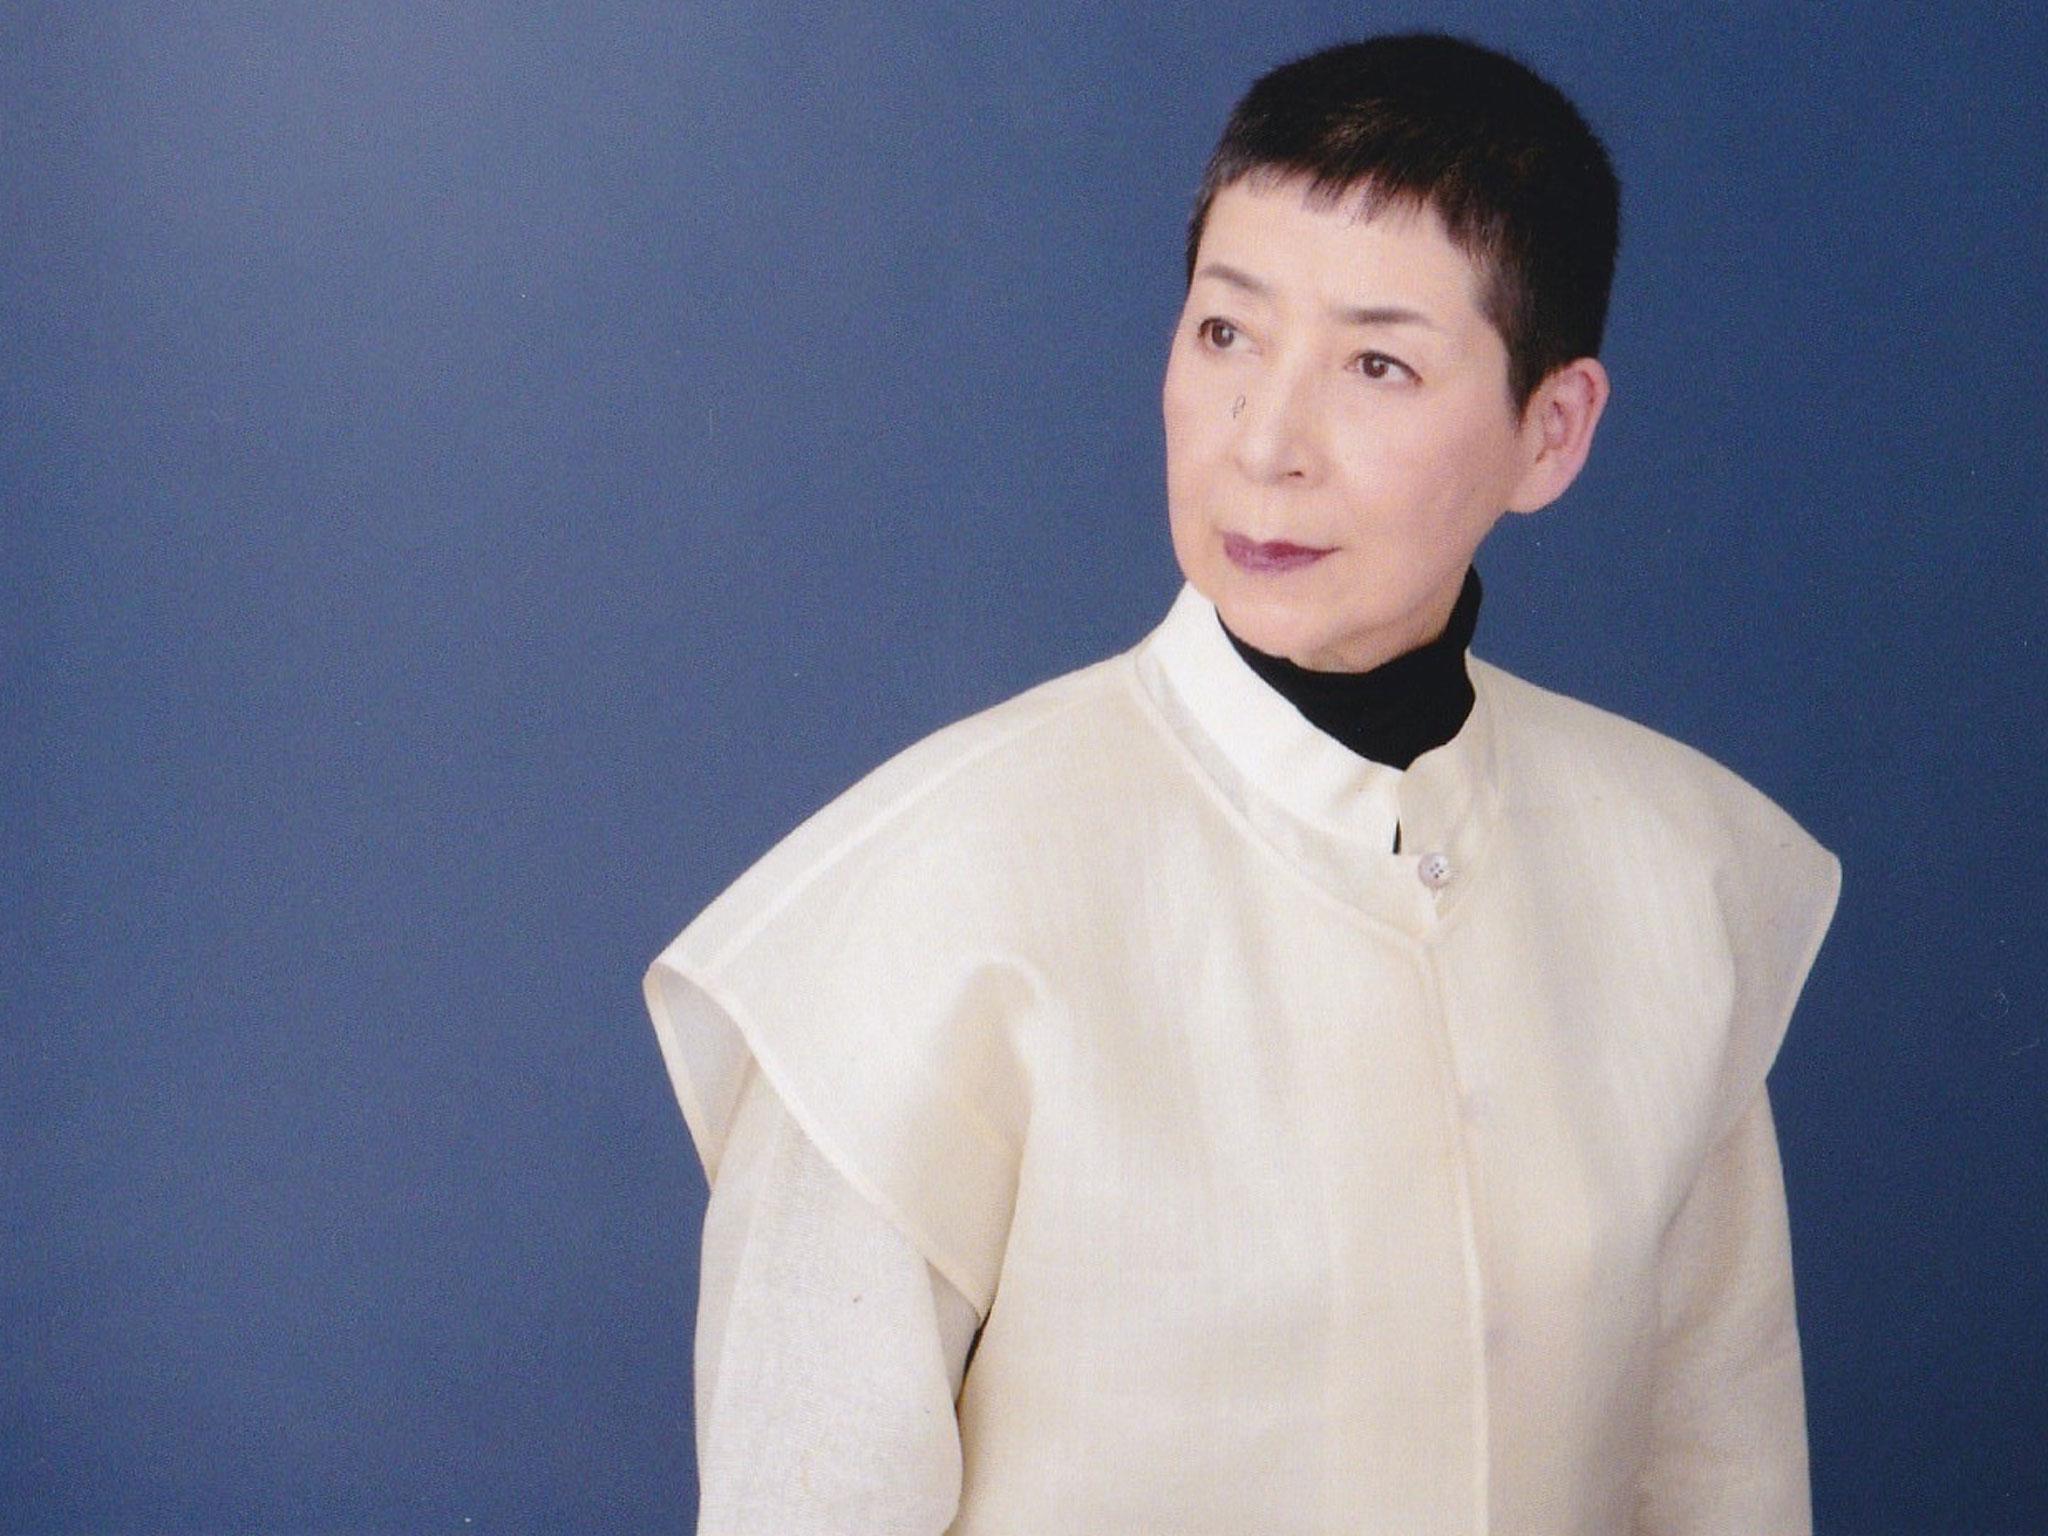 Japanese New Age Composer Midori Takada Will Release A New